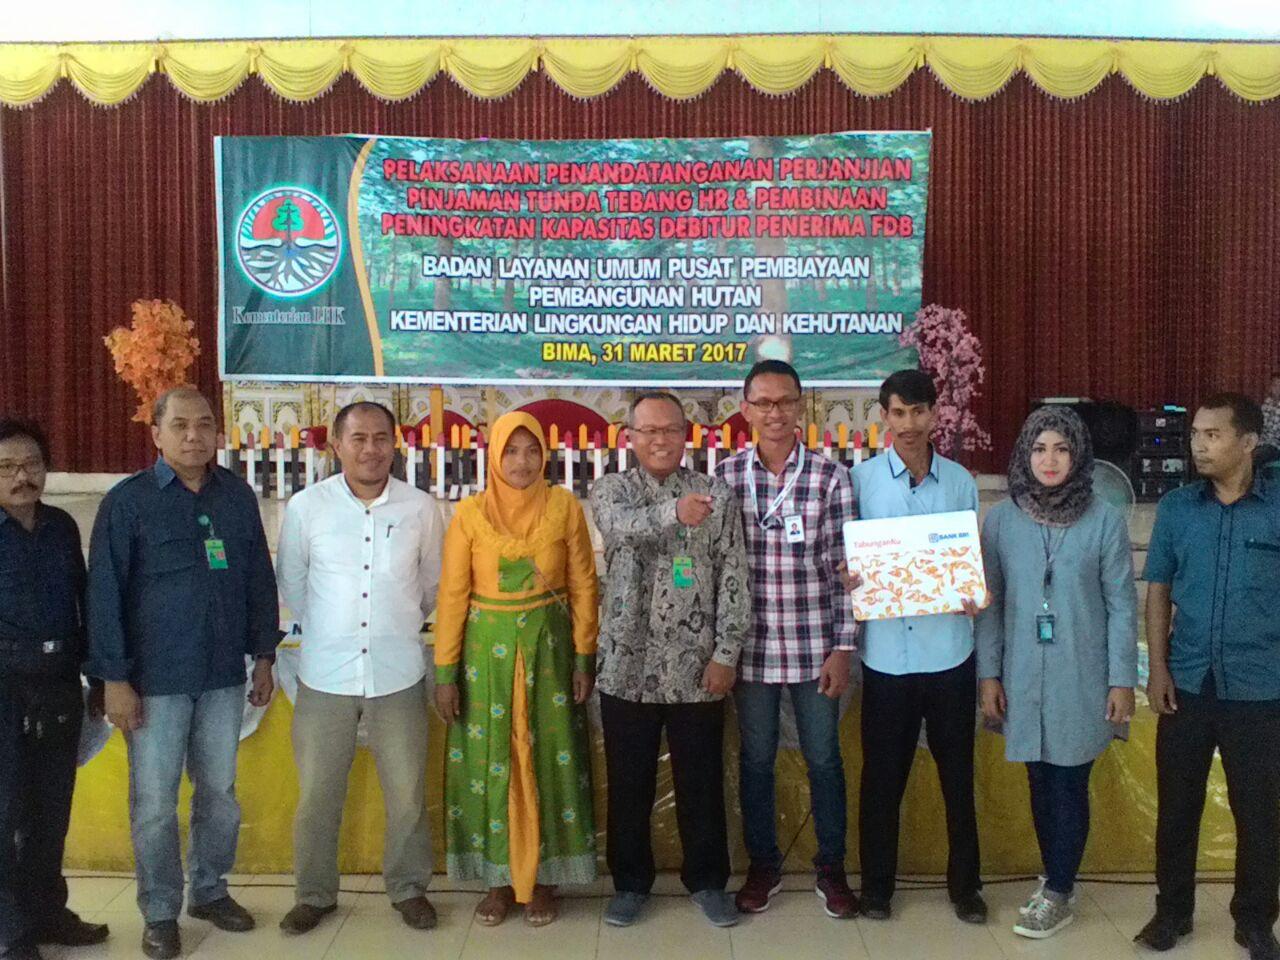 Pinjaman tunda tebang untuk kelompok HR Mori Sama BKPH Ampang Riwo Soromandi